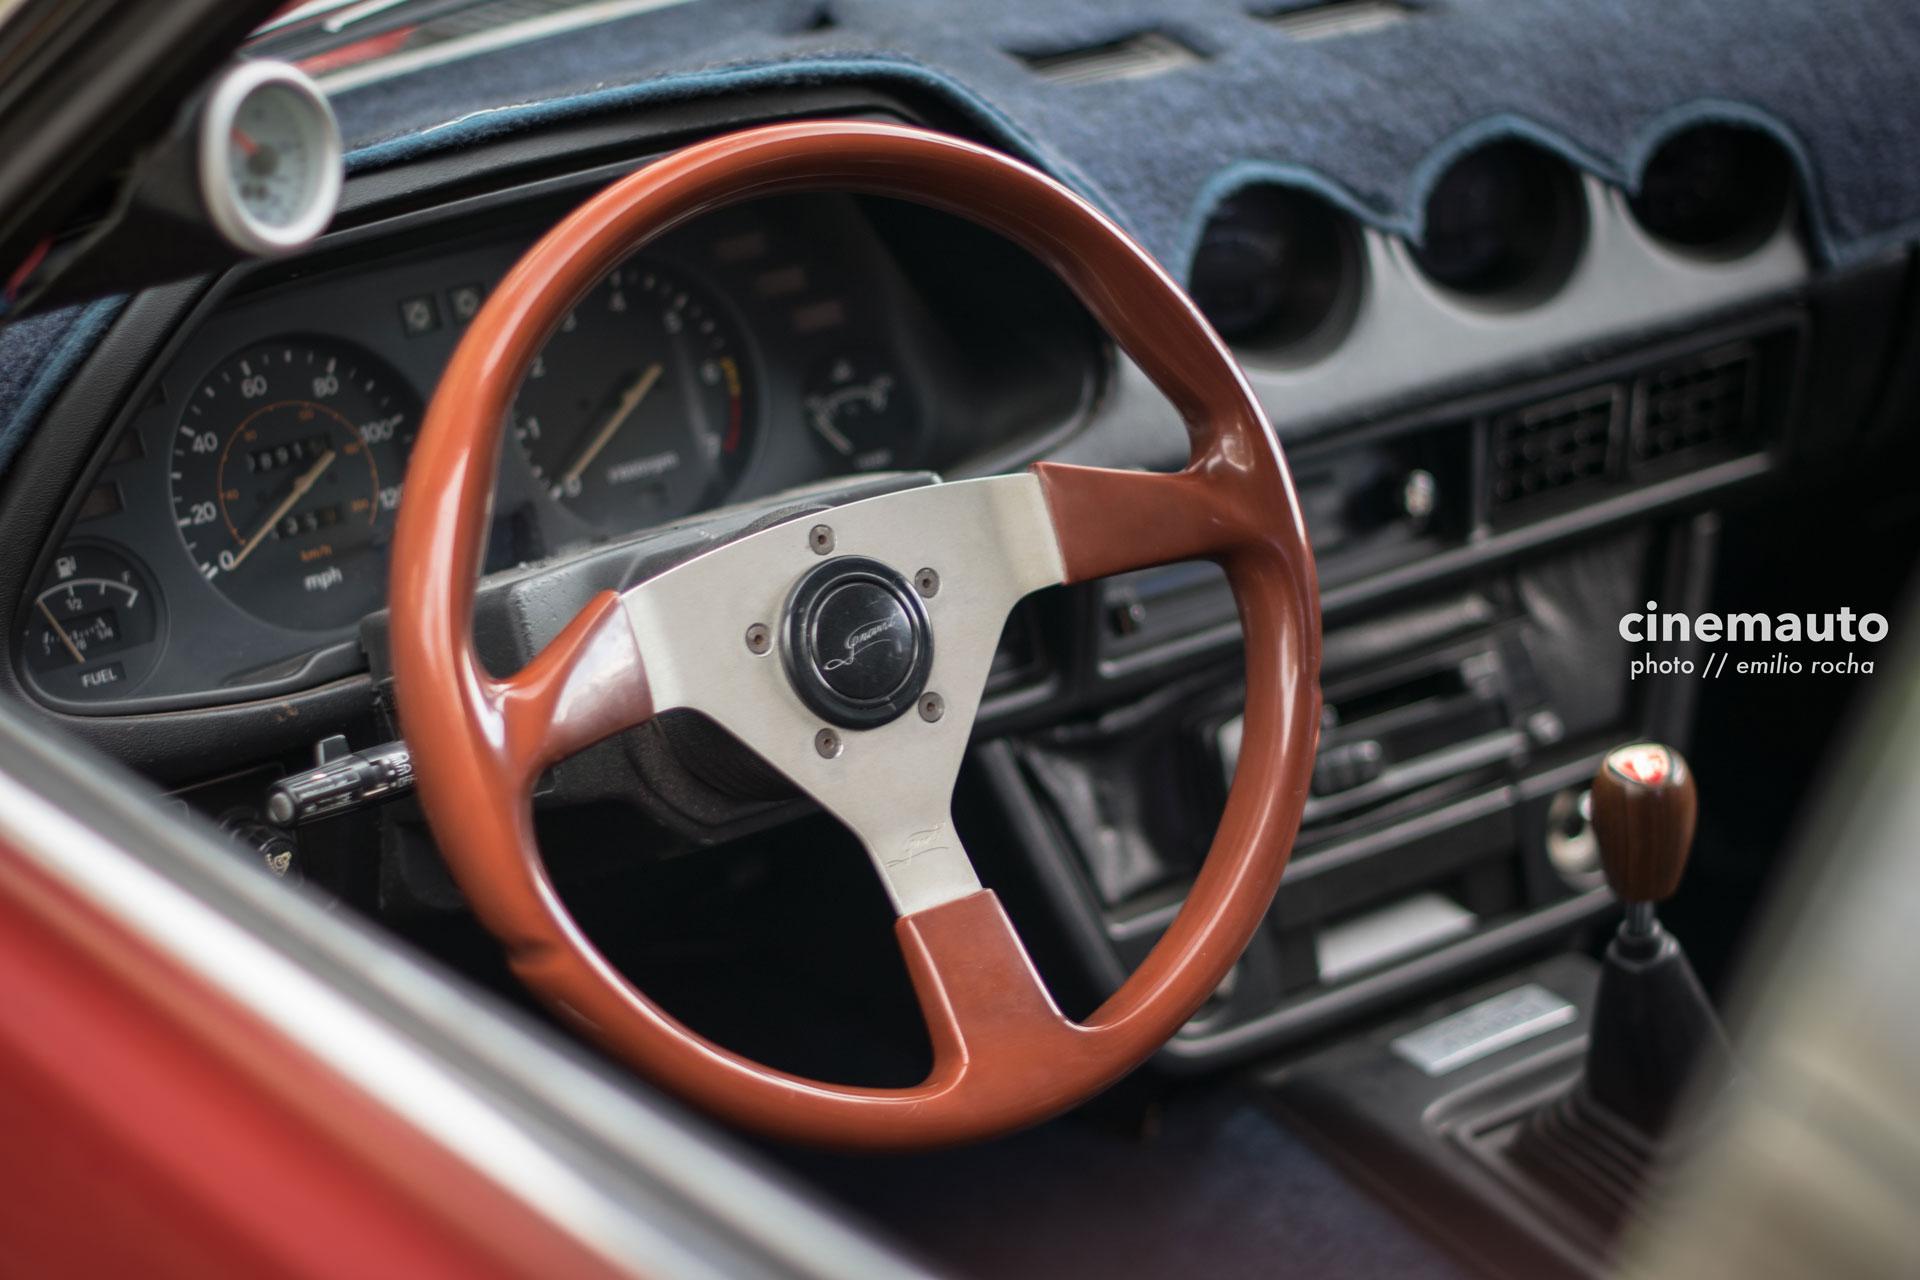 cinemauto-kansas-automotive-photography-datsun12.jpg